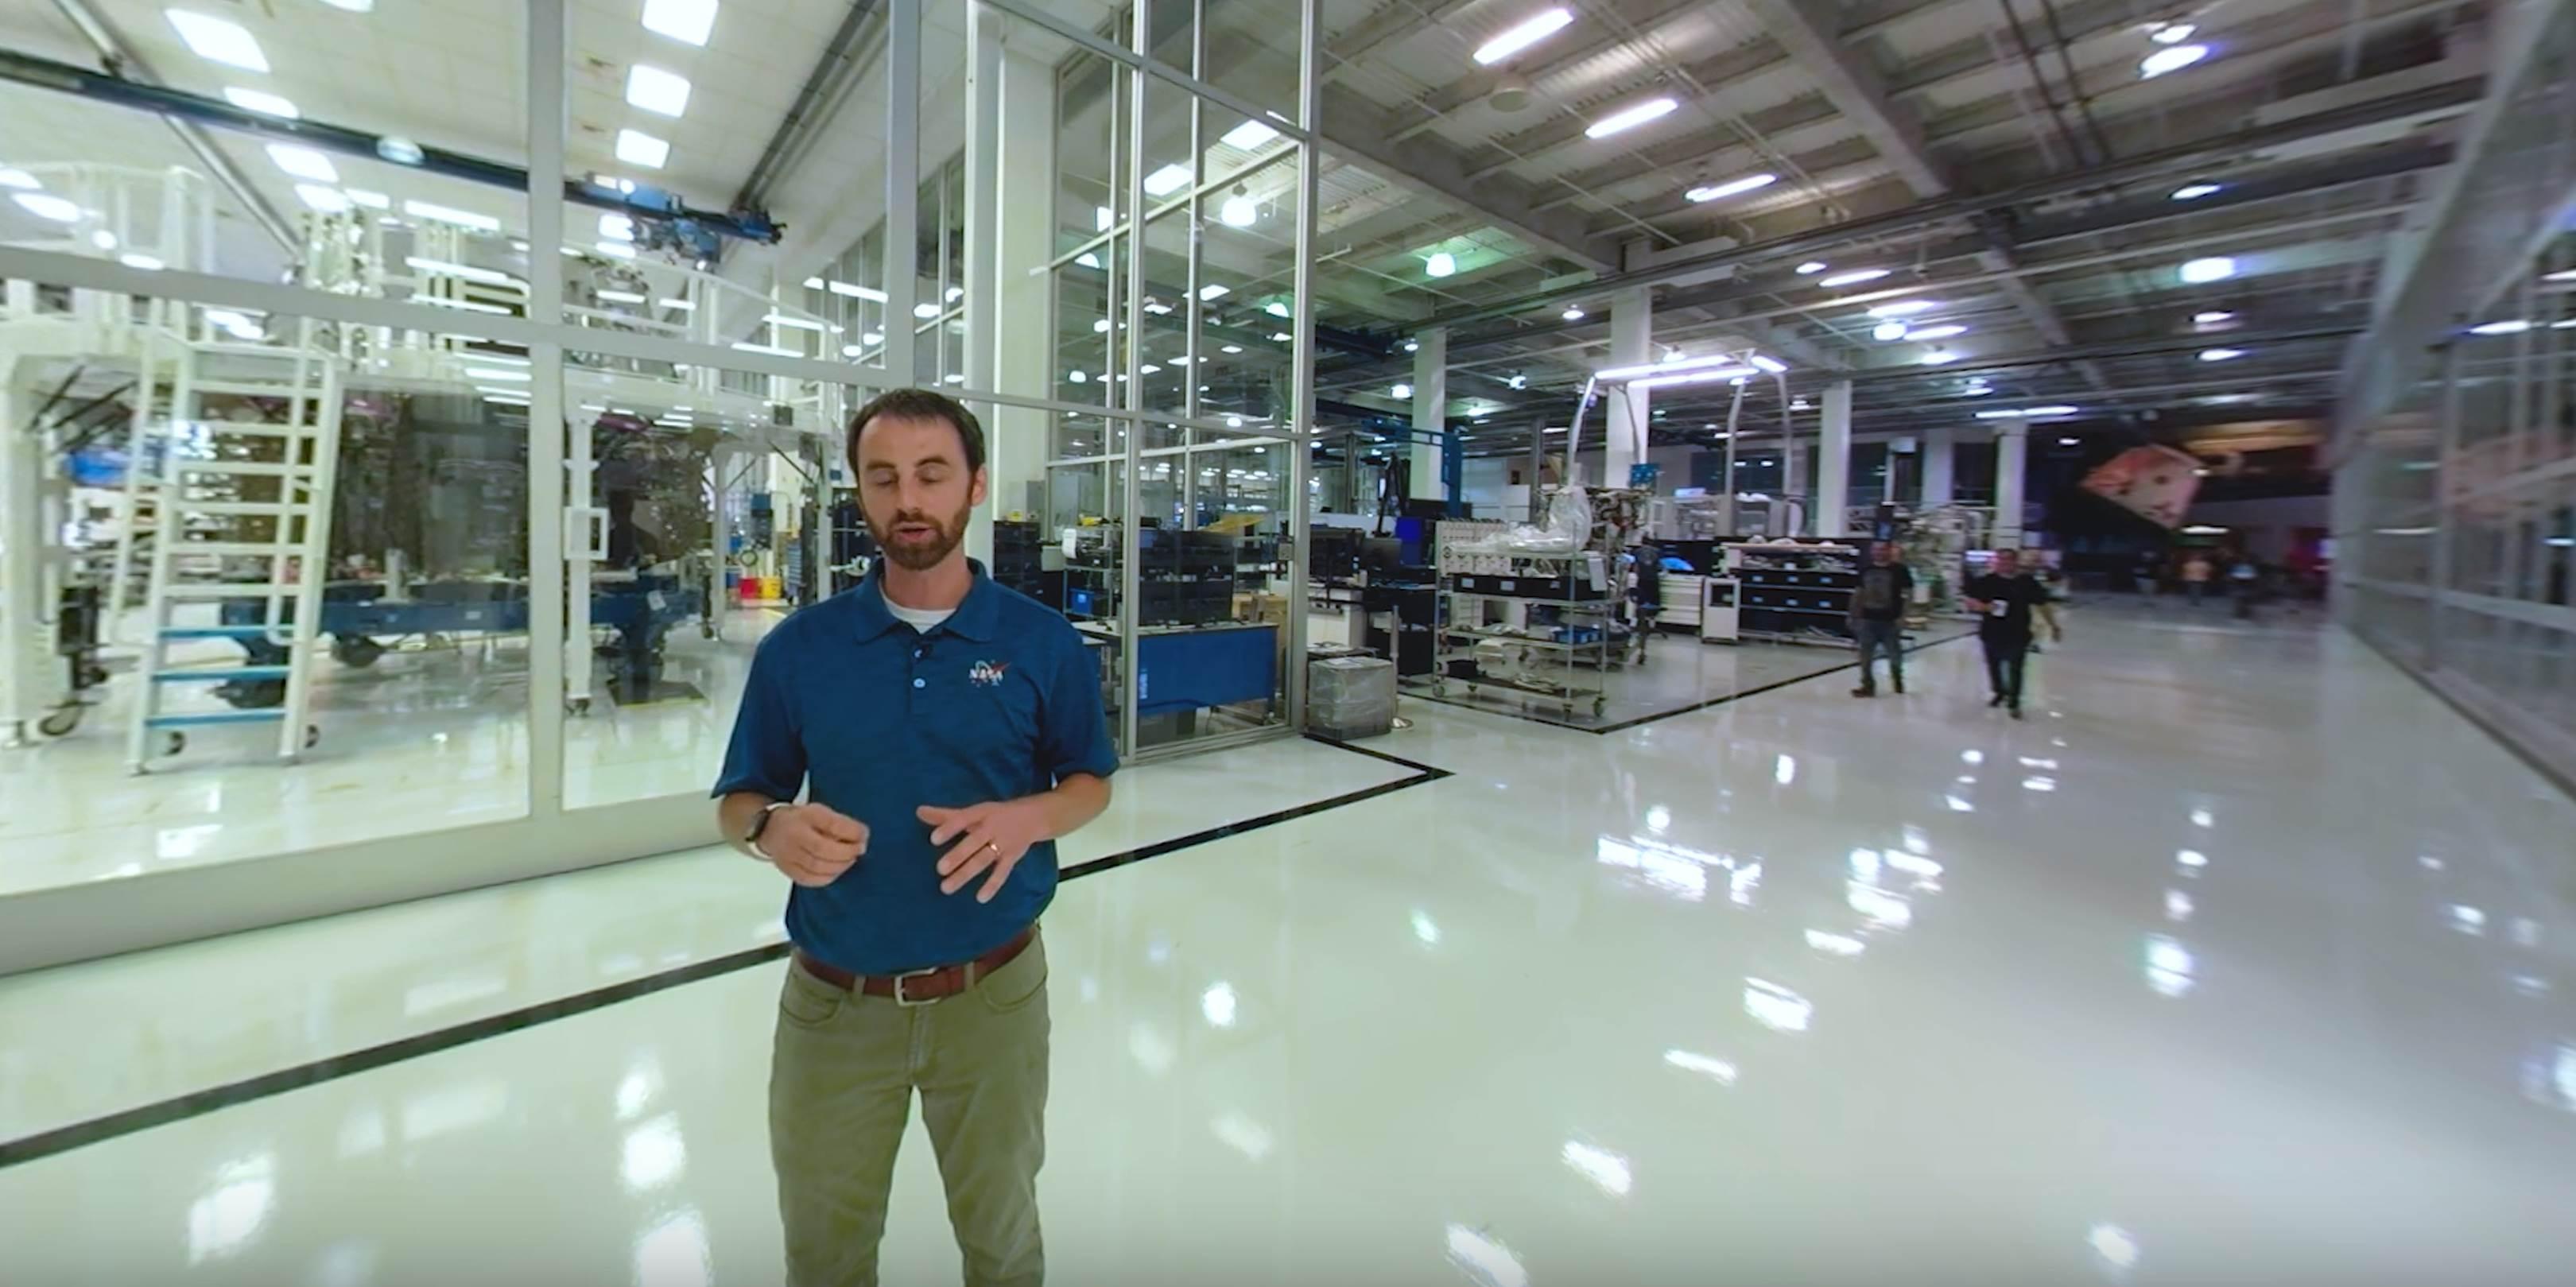 Hawthorne tour 2019 (NASA) factory floor dragon production 1